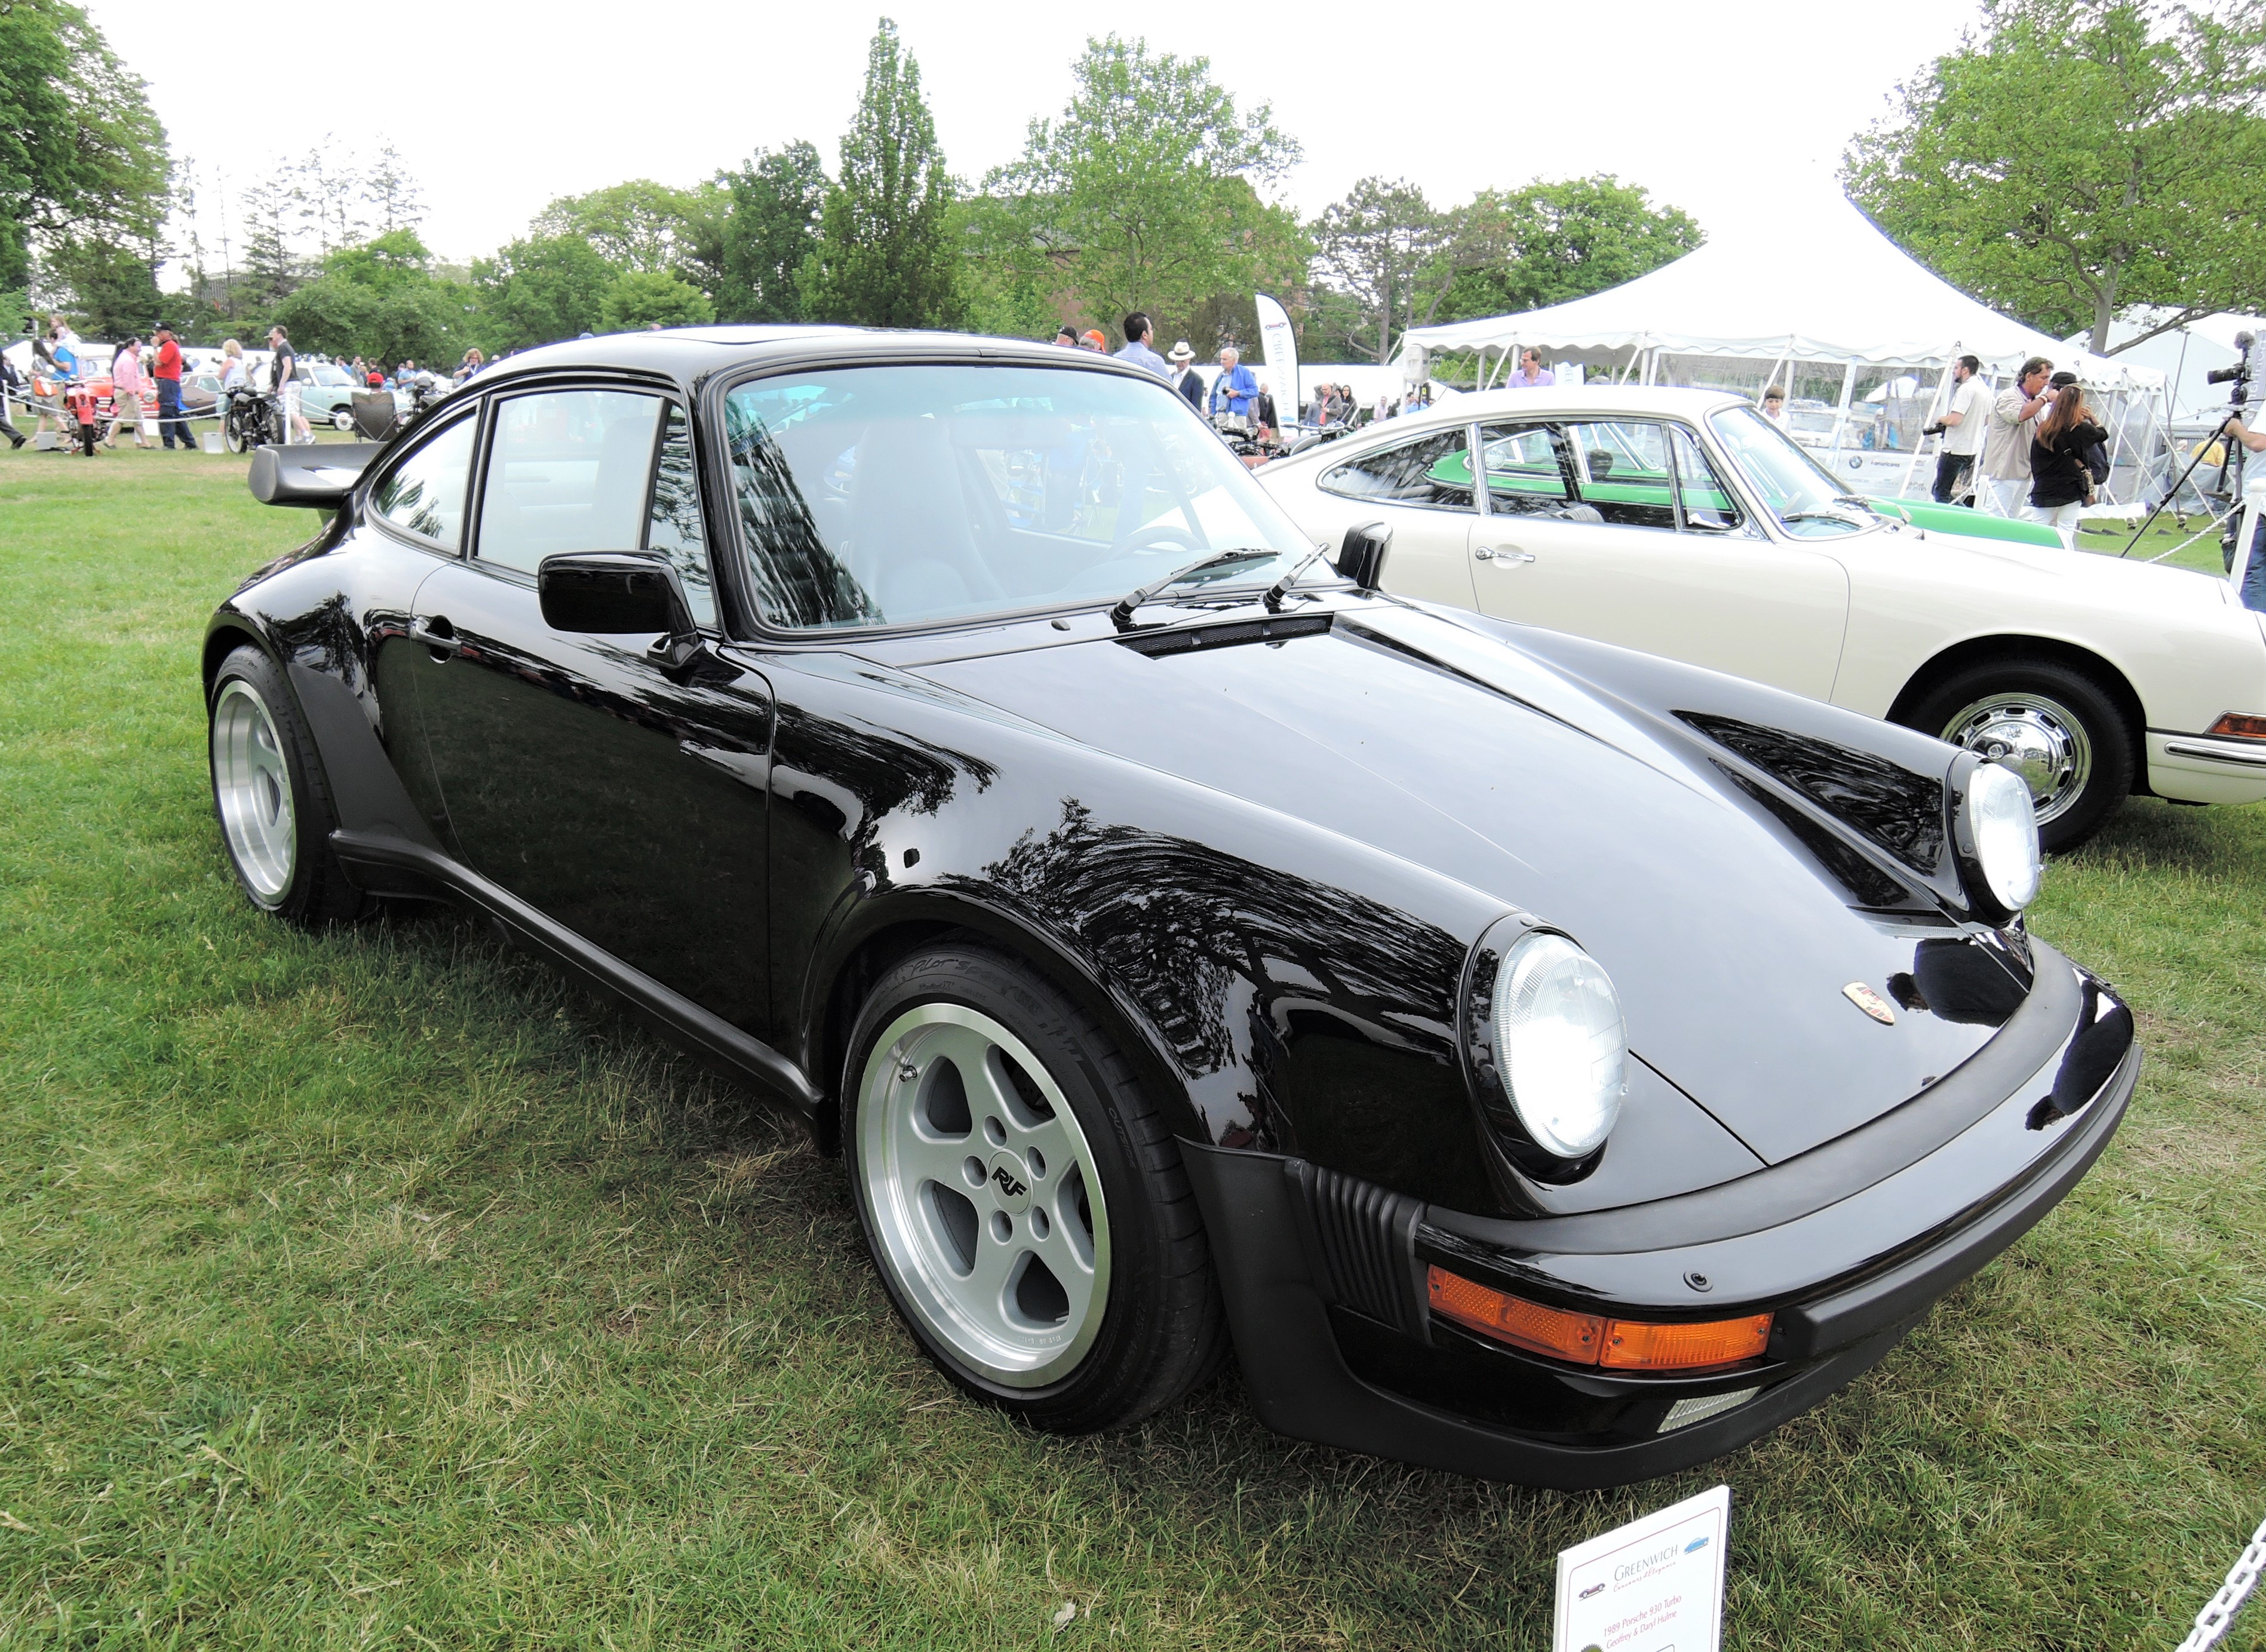 black 1989 Porsche 930 Turbo Coupe - Greenwich Concours d'Elegance 2017